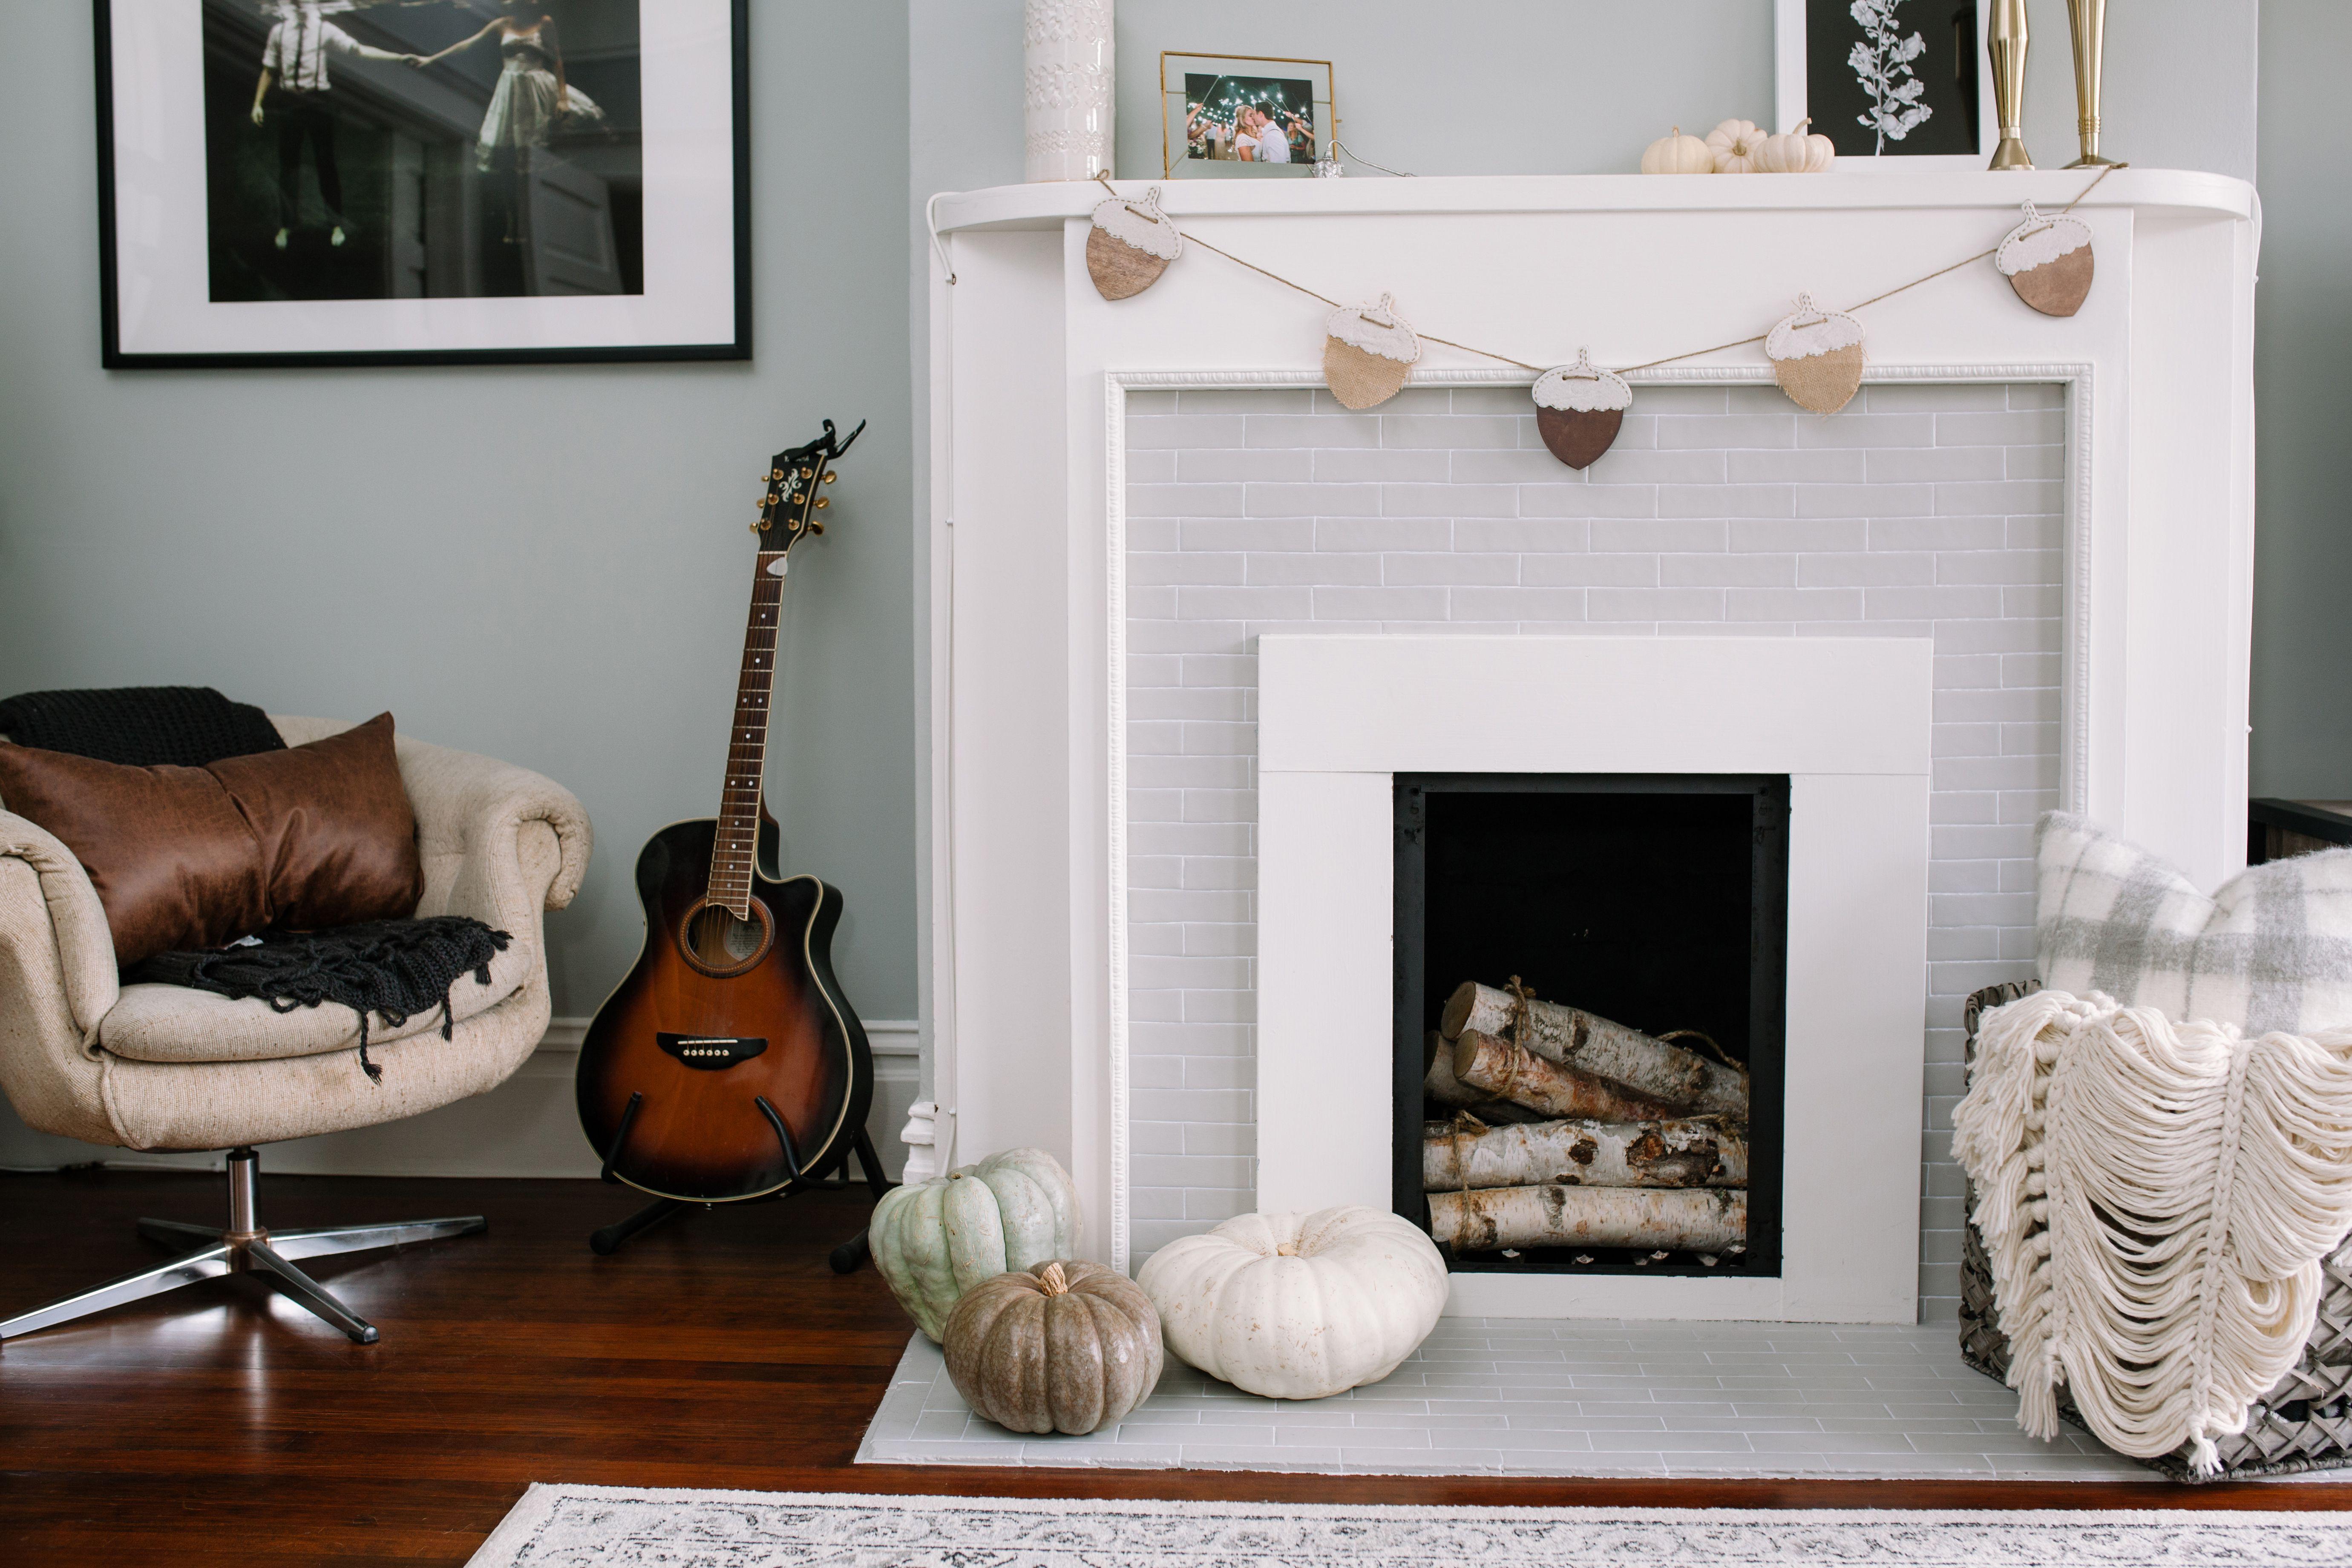 fin 15 soft gray Fireplace 59ee3463d963ac0010cd08c8